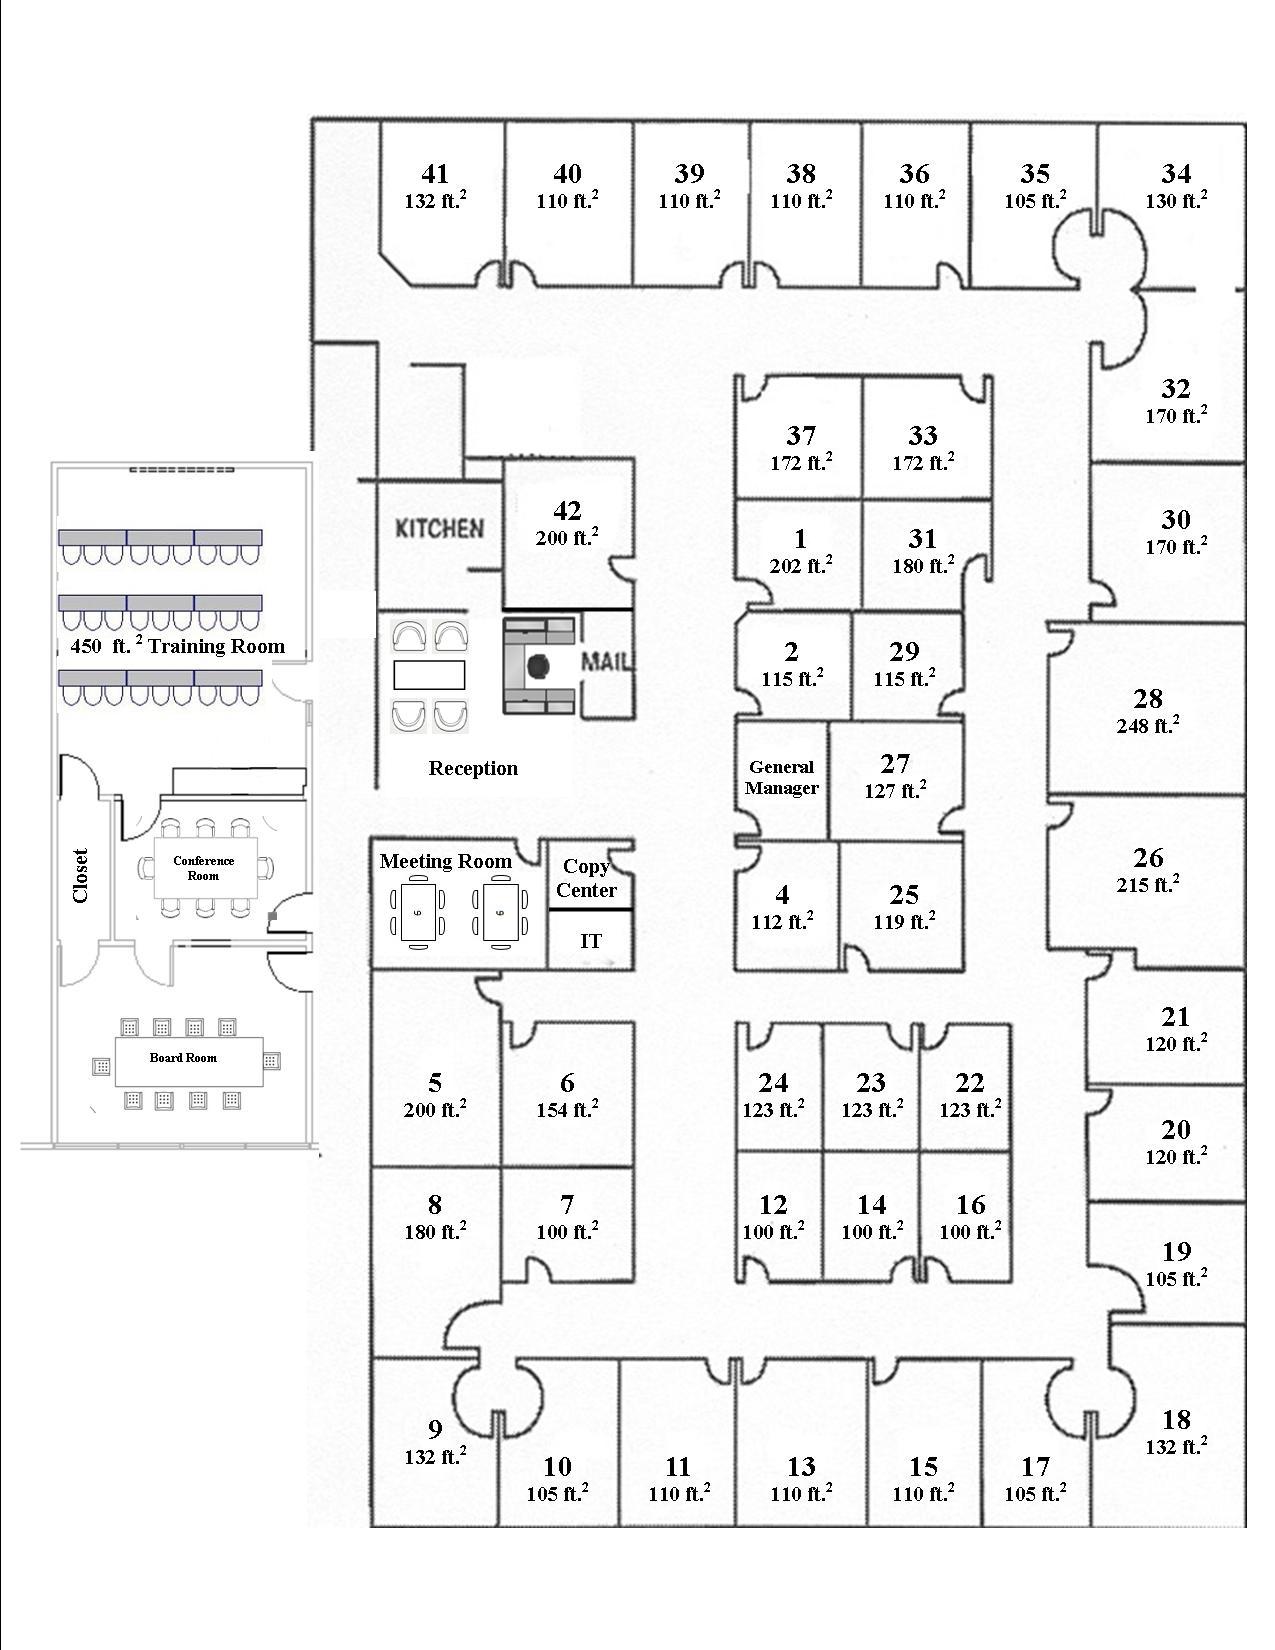 Floor Plan For Nashville Office Space At Perimeter Park Executive Center